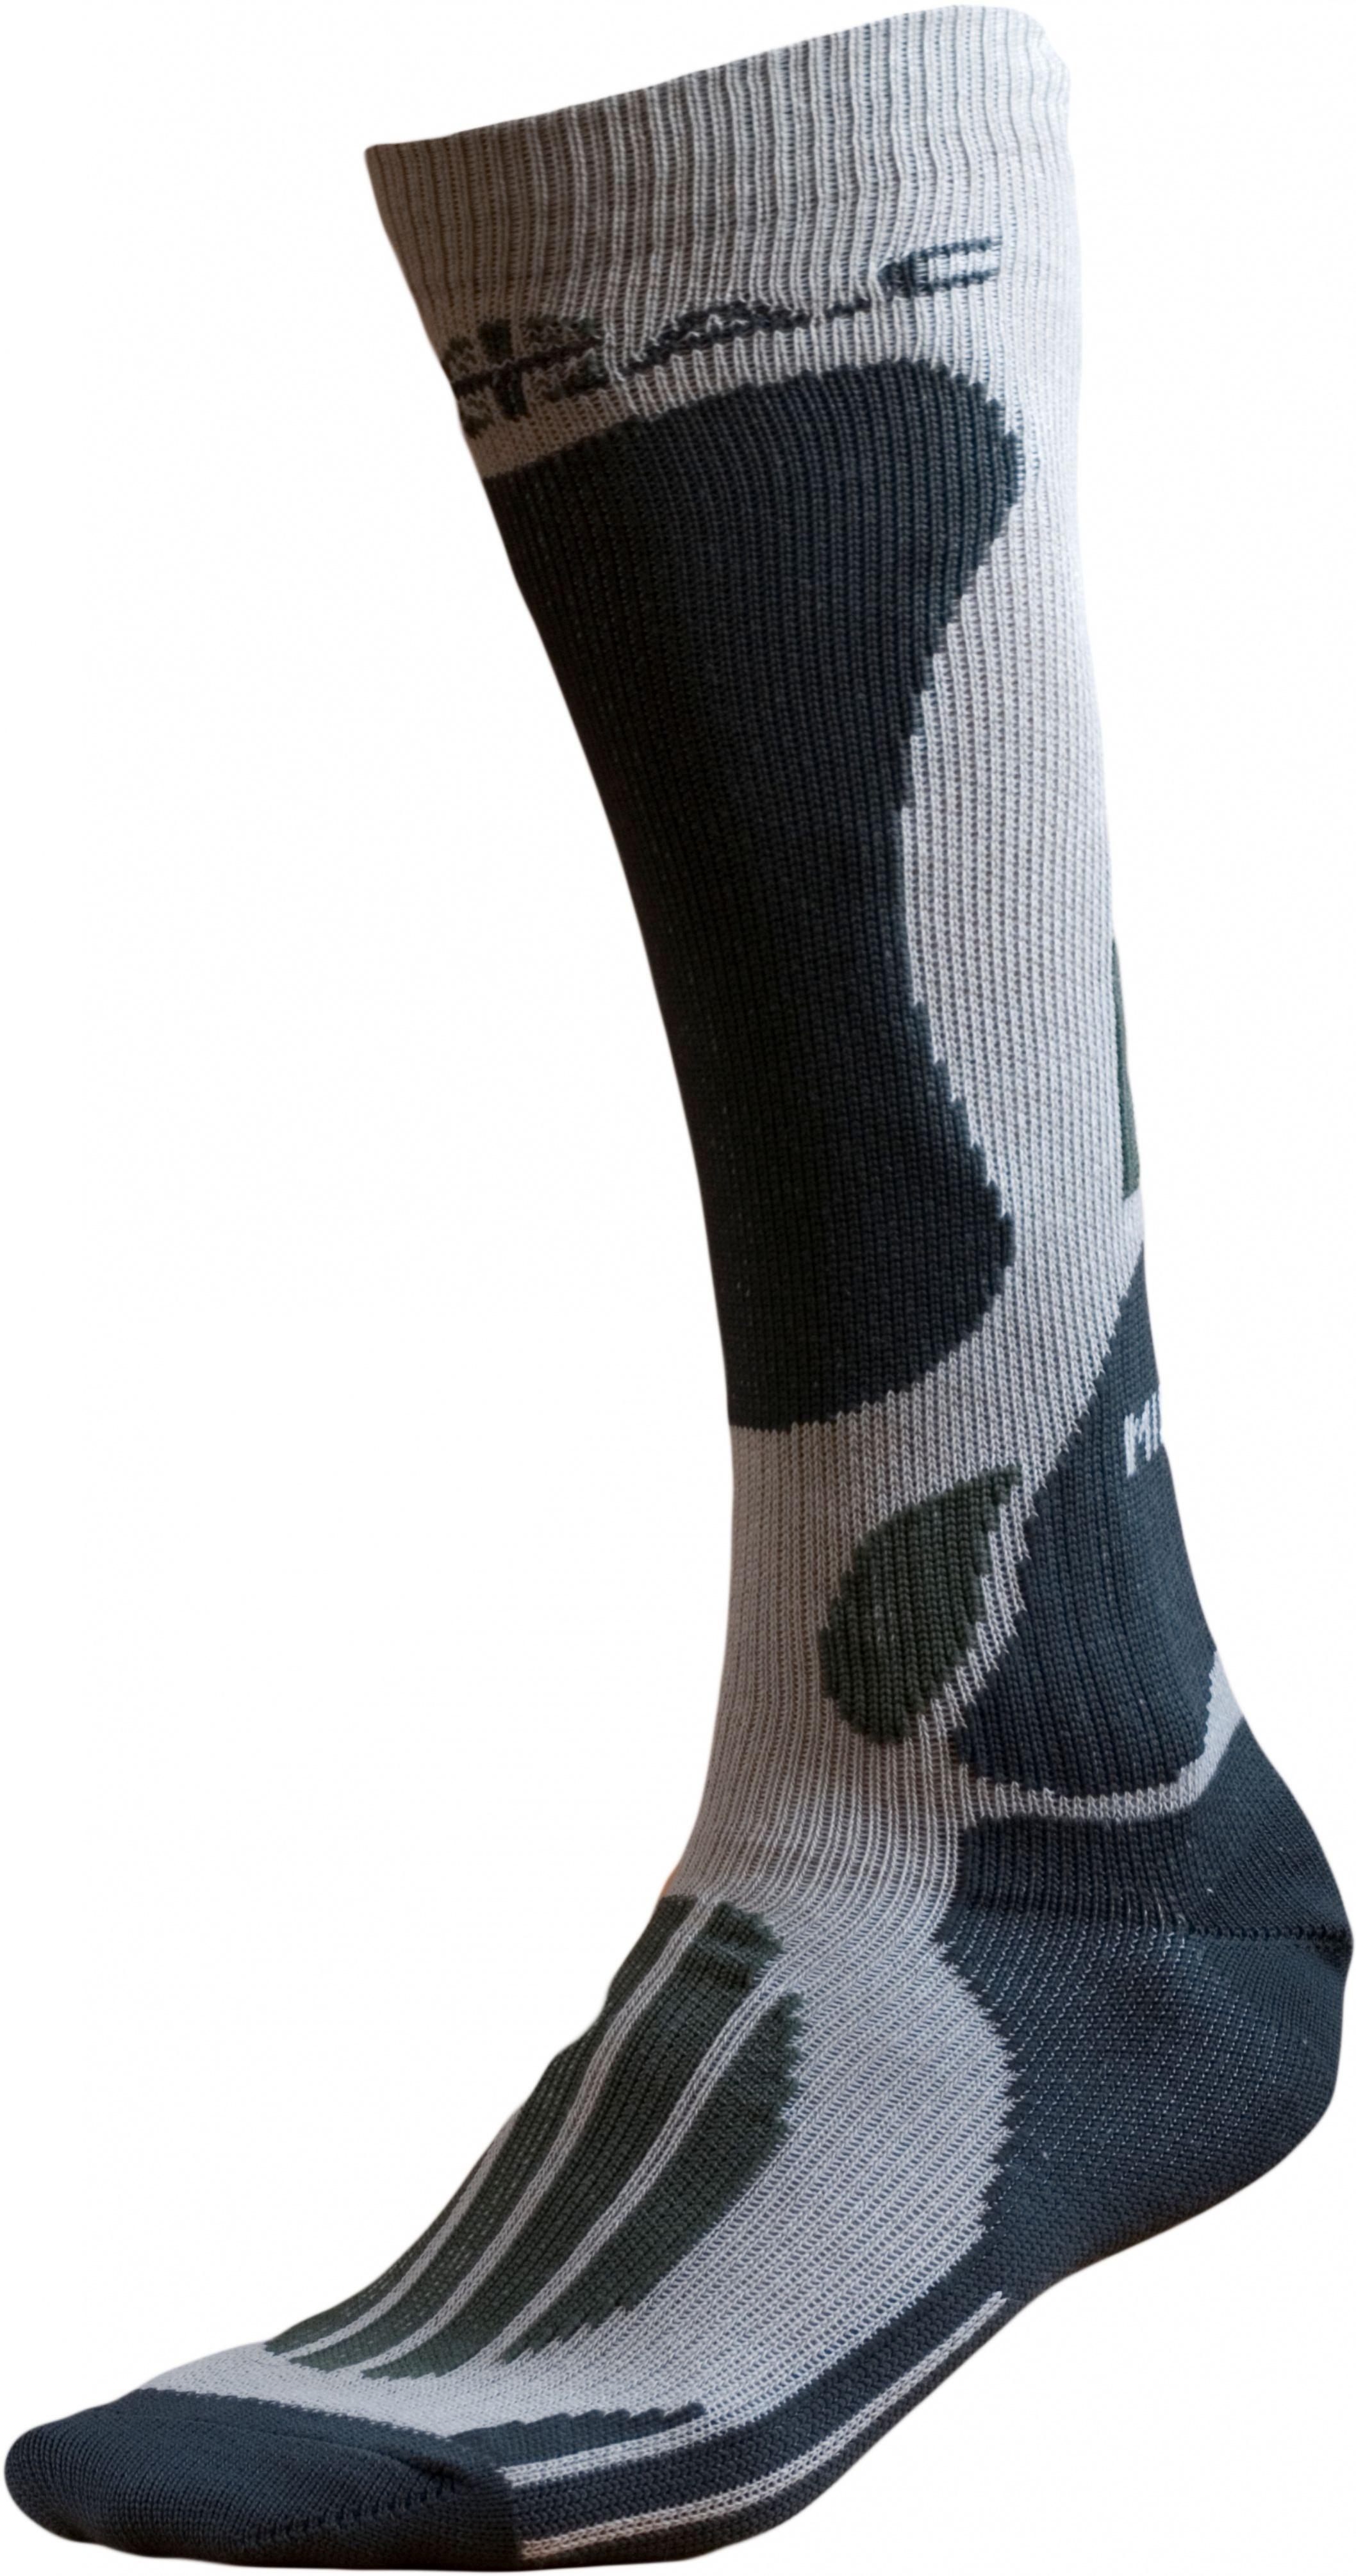 Ponožky BATAC Mission MI13 vel. 36-38 - green